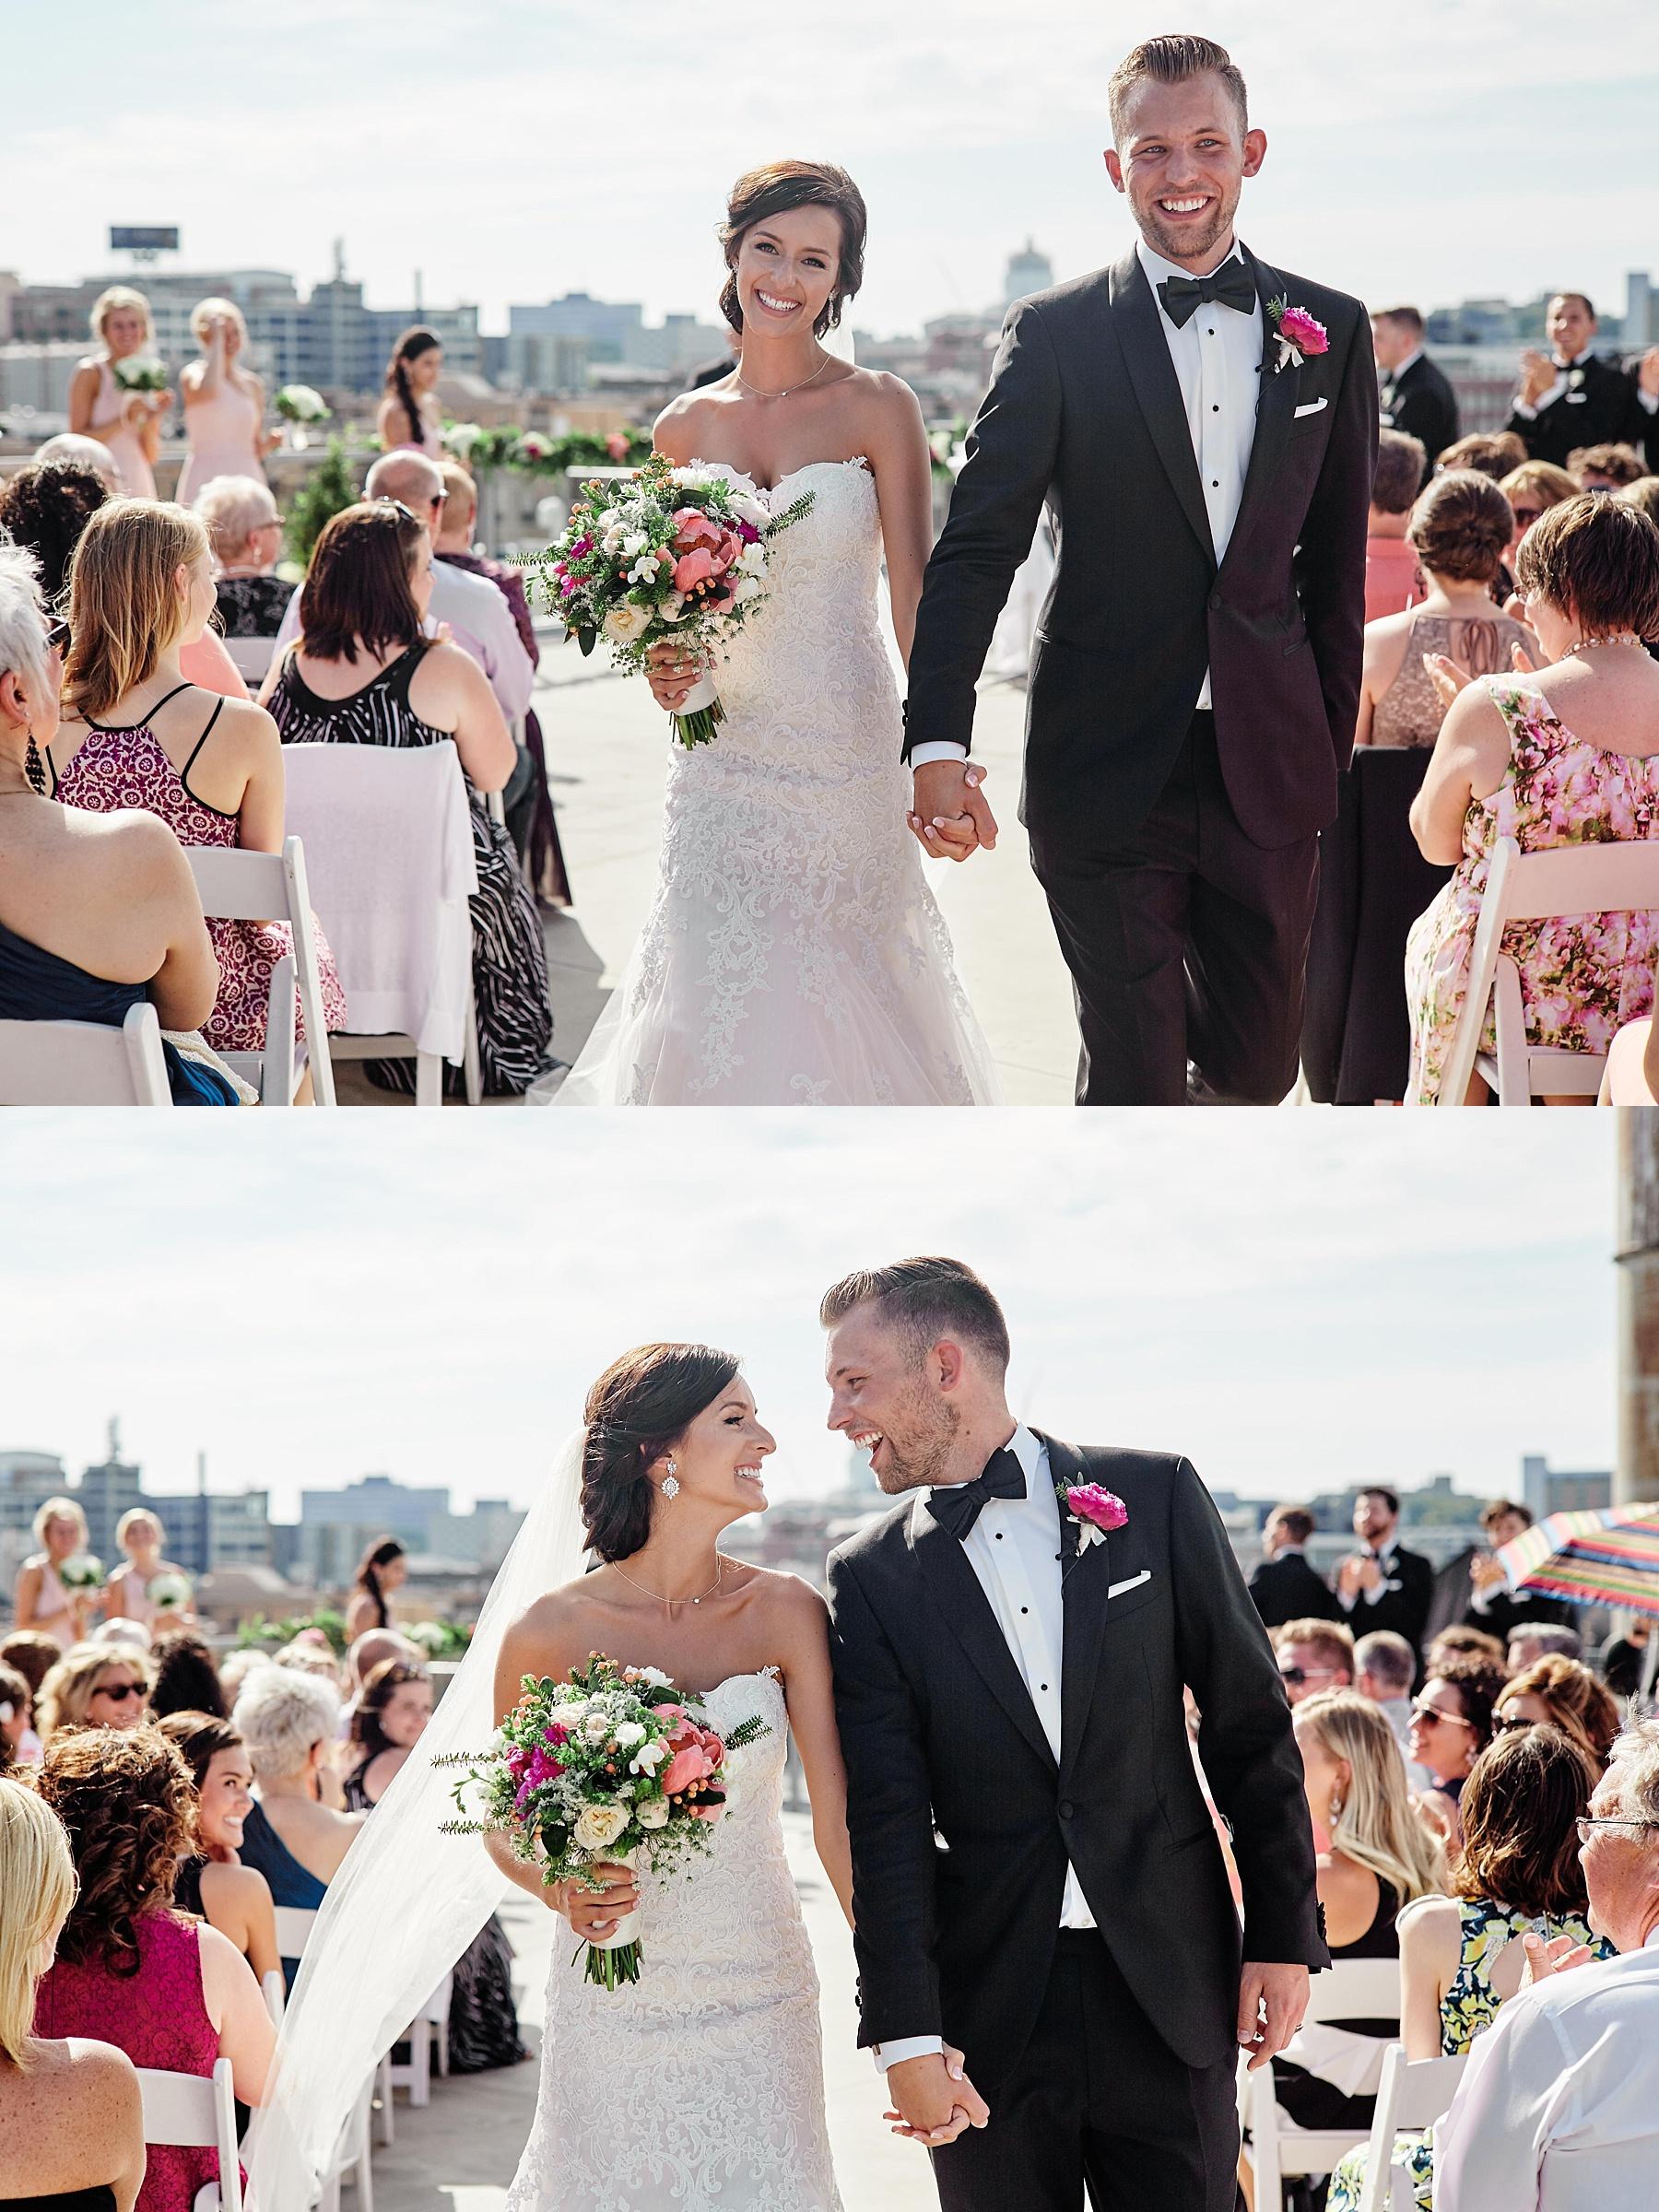 ABULAE-Wedding-Saint-paul-MN-Josh-Sofia-Wedding-Mears-Park_0777.jpg